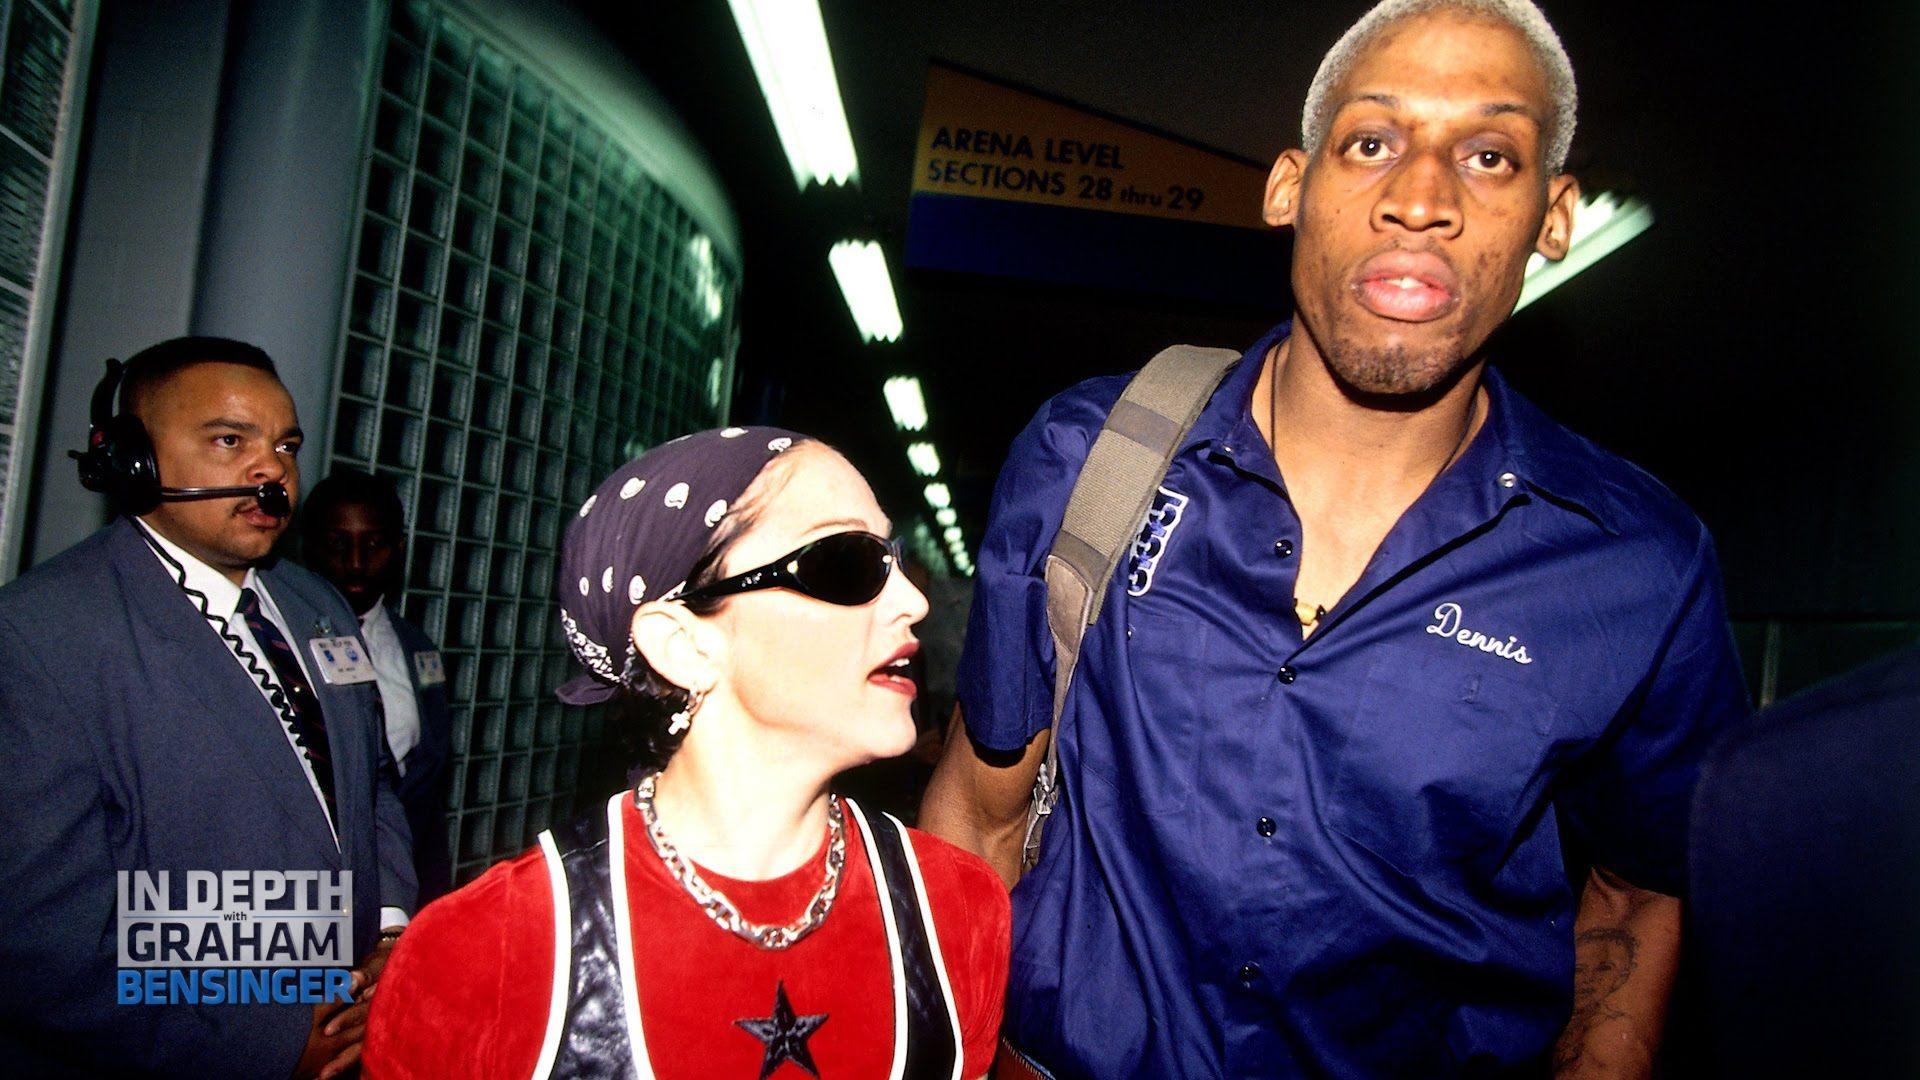 Madonna and Dennis Rodman walk together